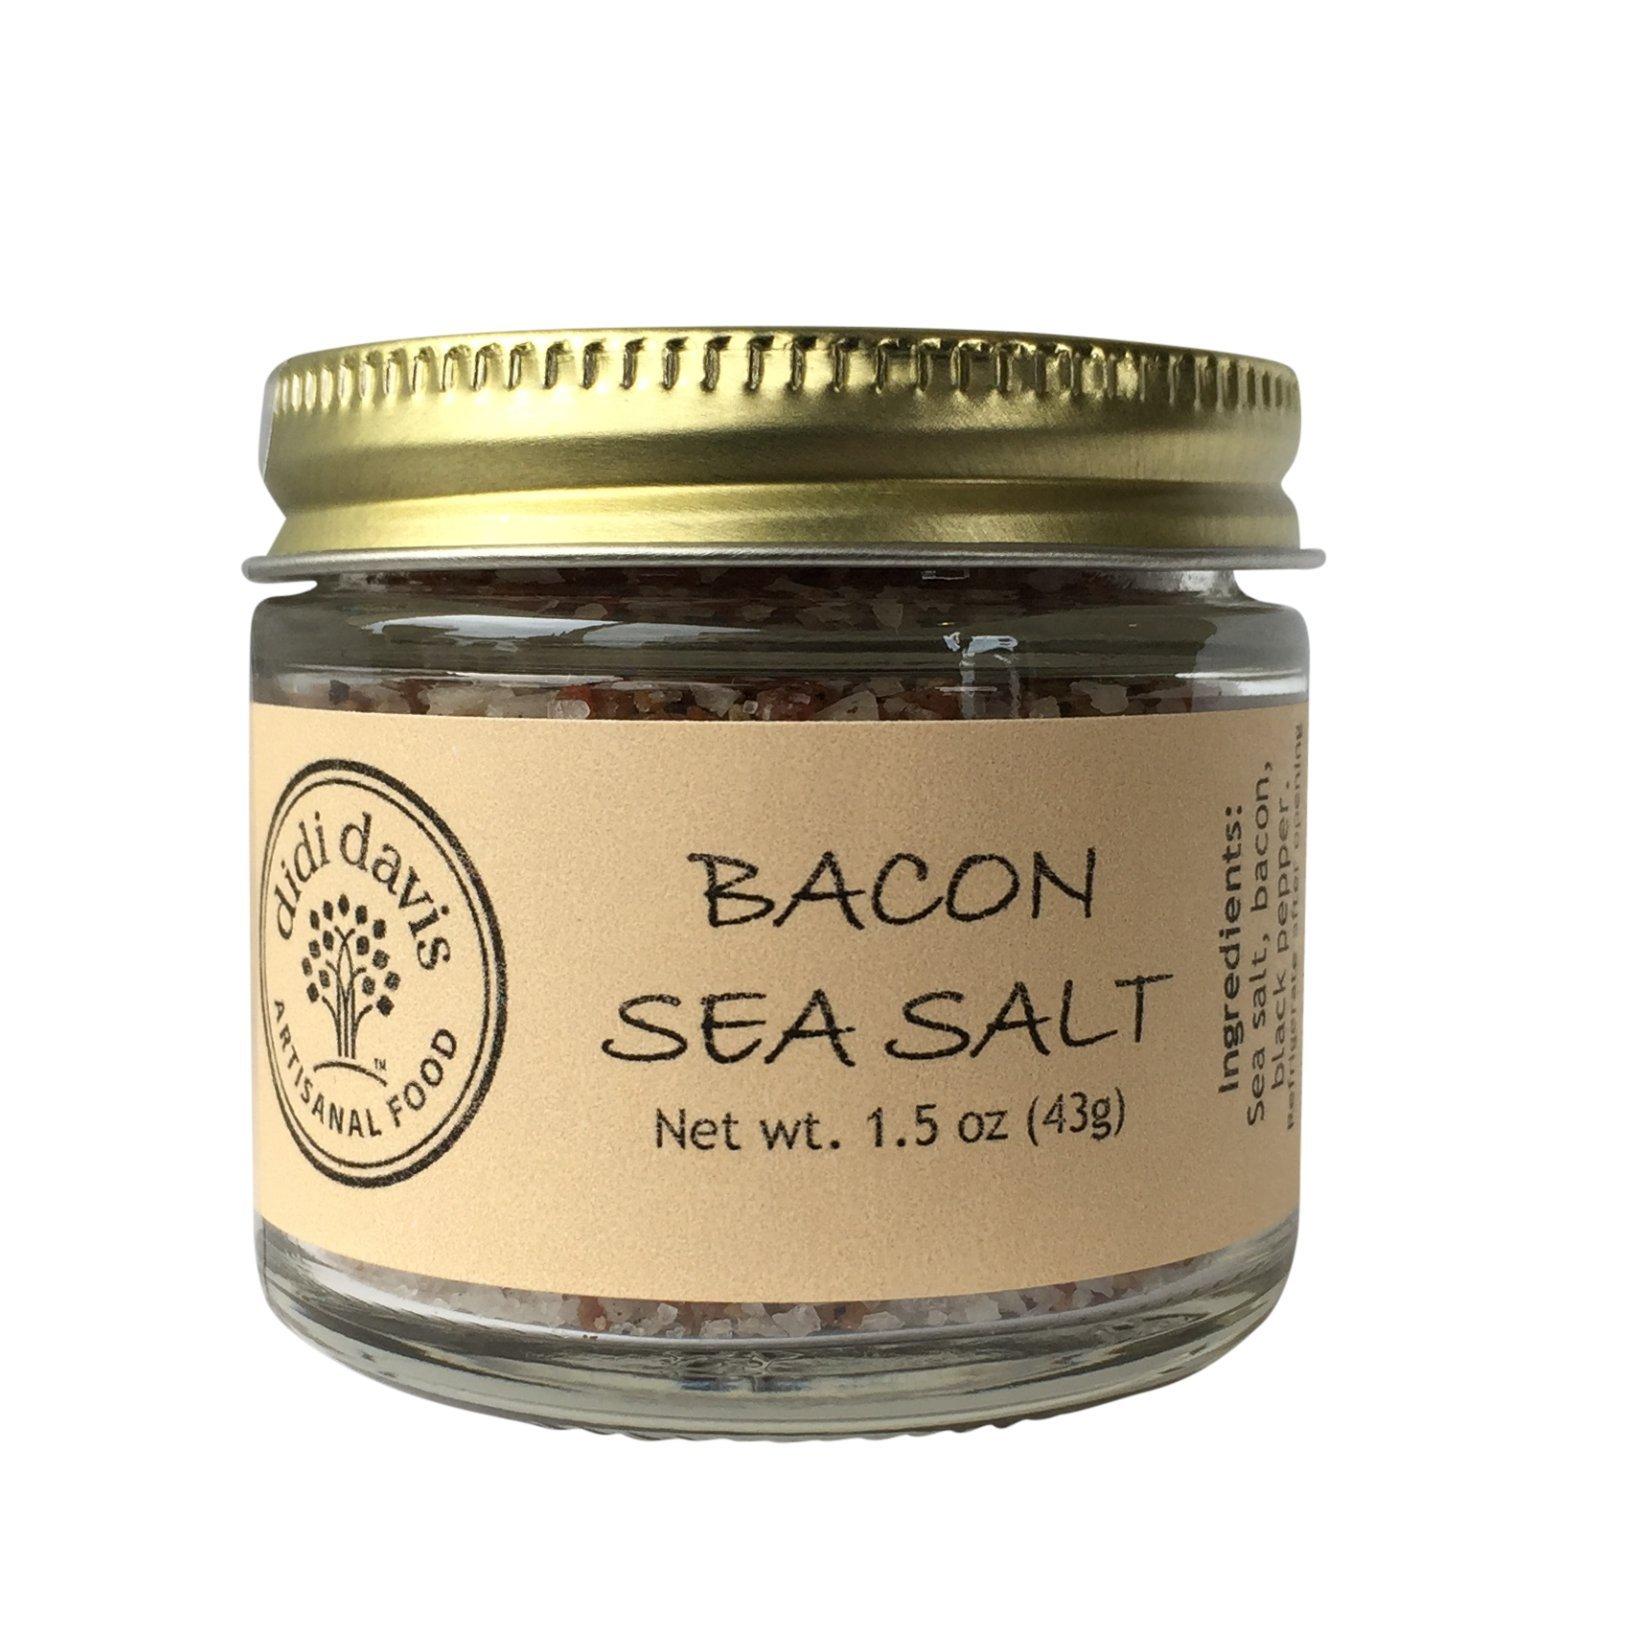 didi davis food (Salt Traders) Real Smoked Bacon Flavored Sea Salt - 1.5 oz Net Wt. (Glass Jar)